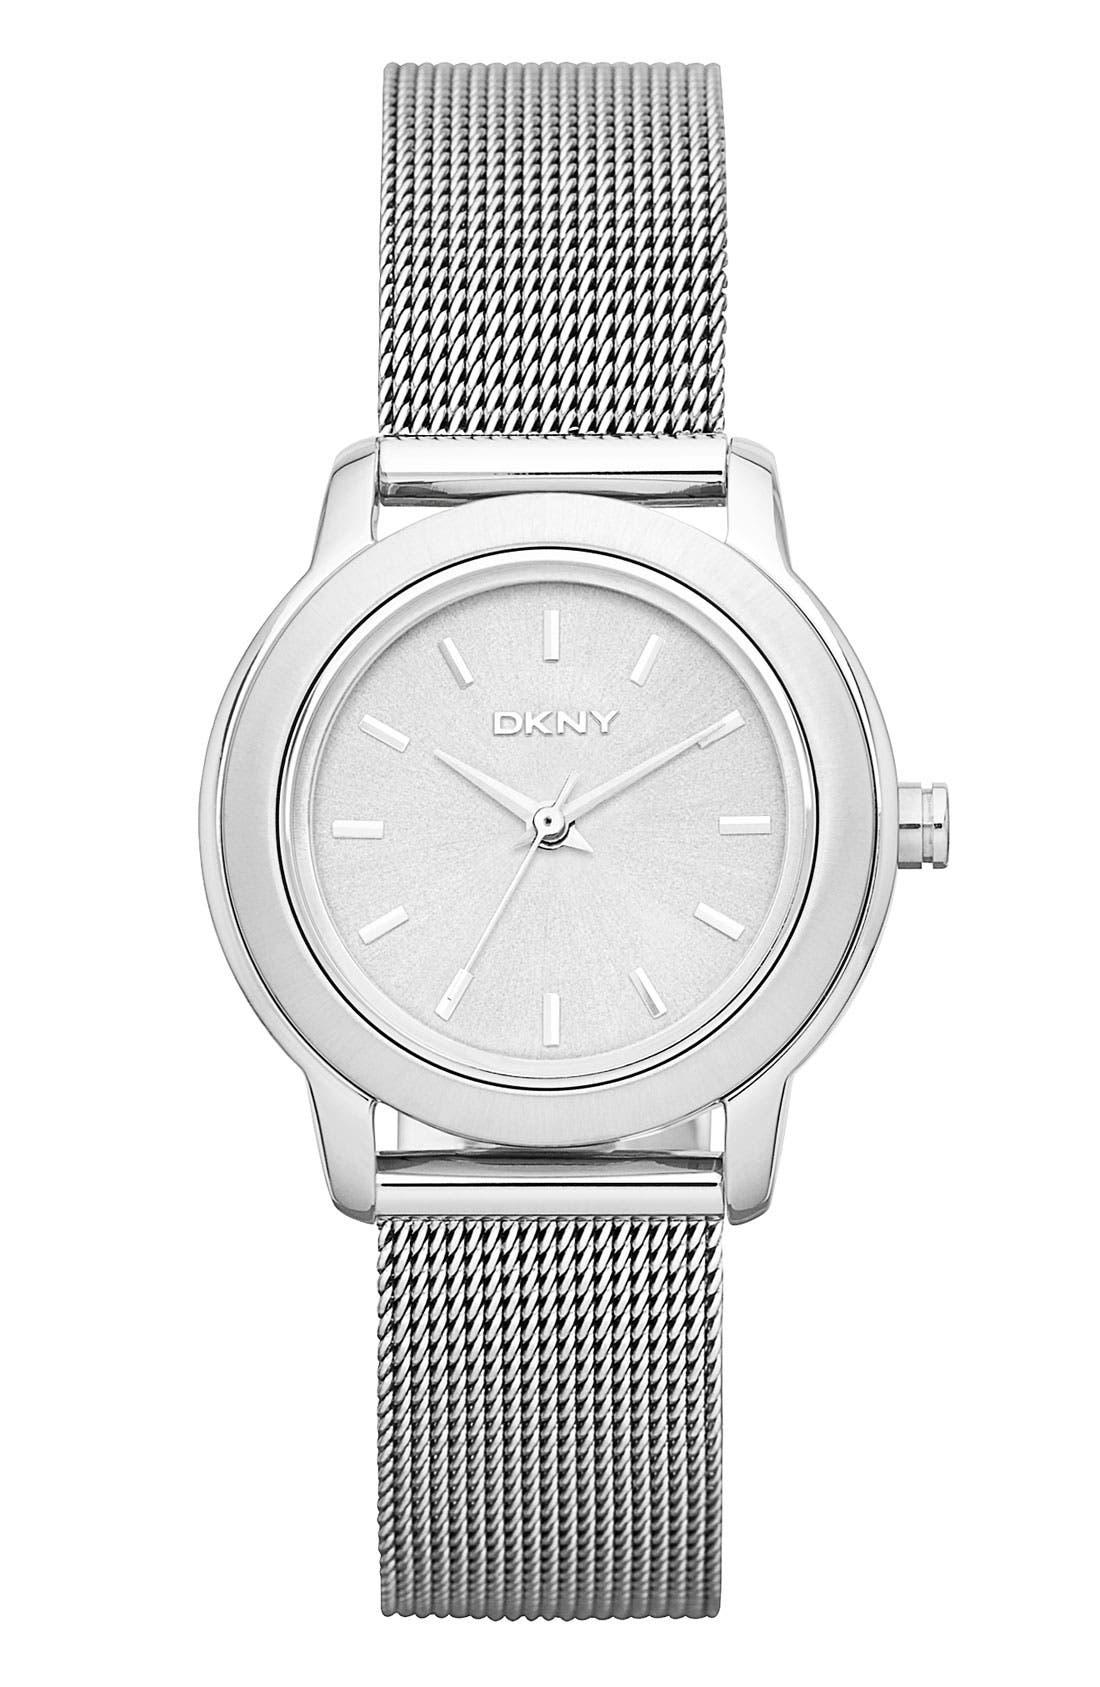 Main Image - DKNY 'Tompkins' Mesh Bracelet Watch, 28mm